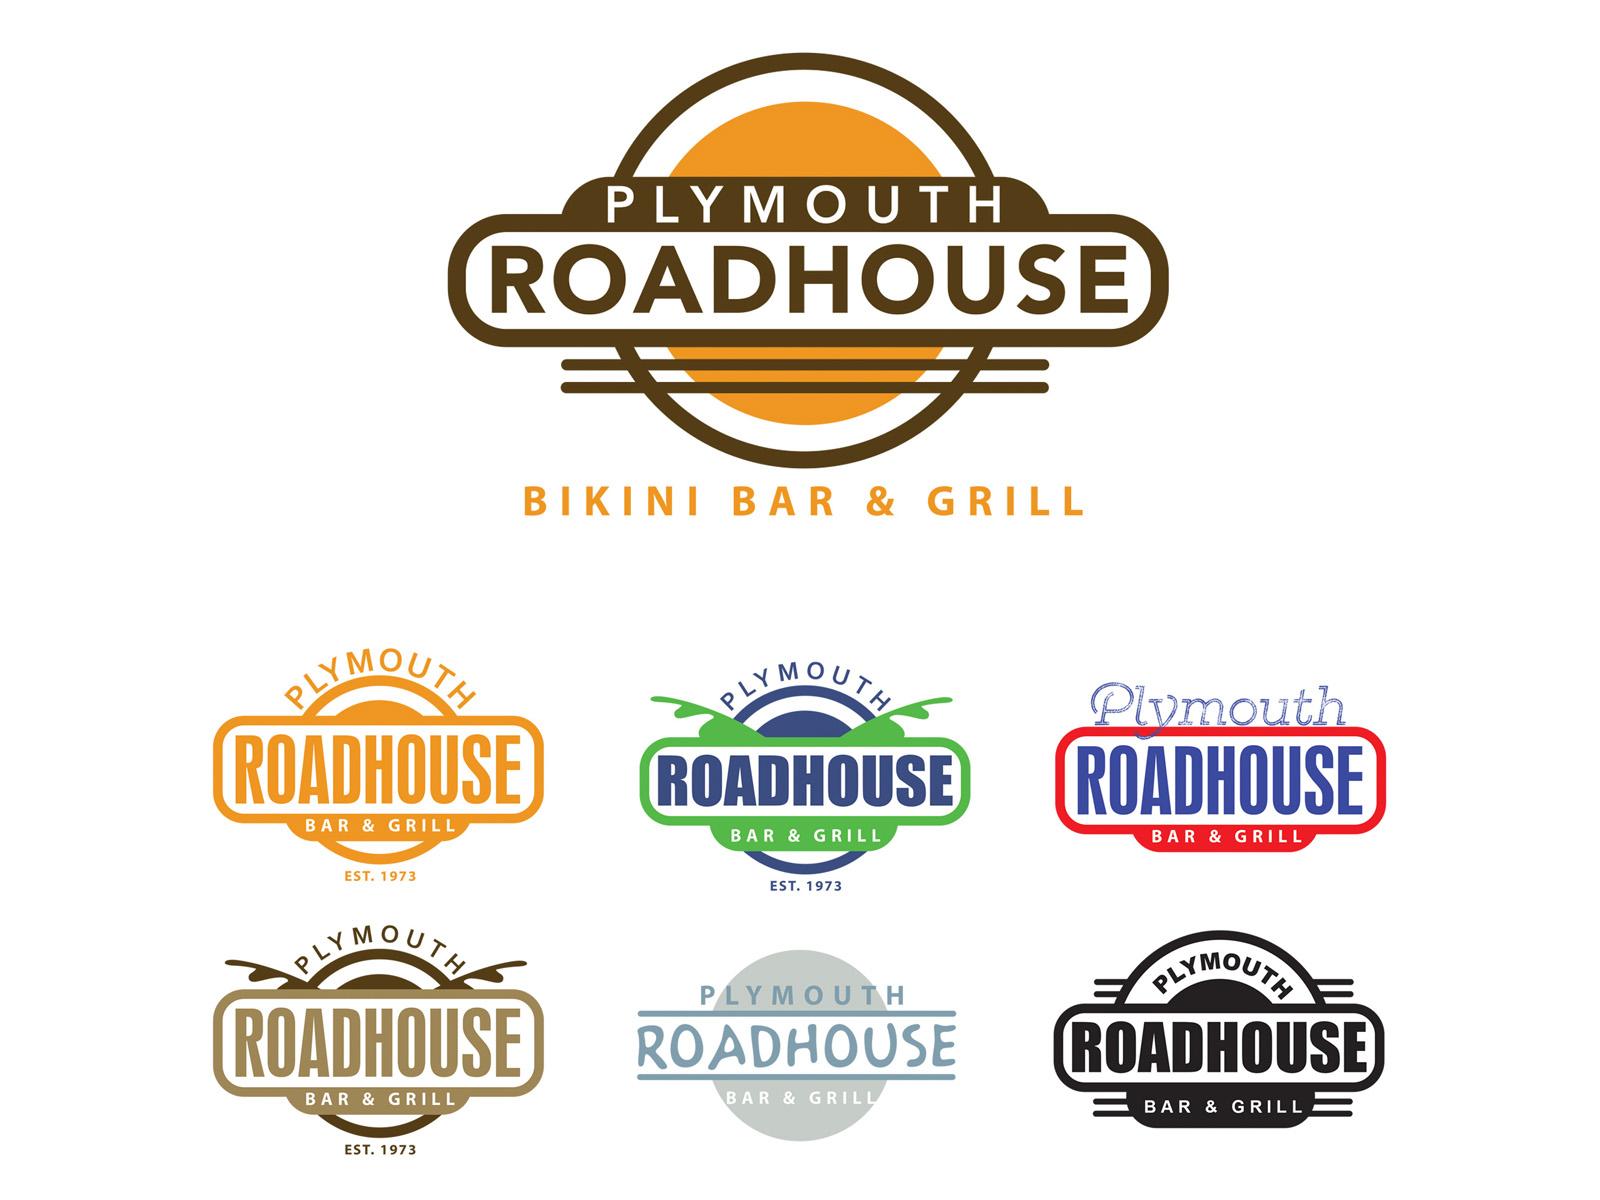 Plymouth Roadhouse Logos